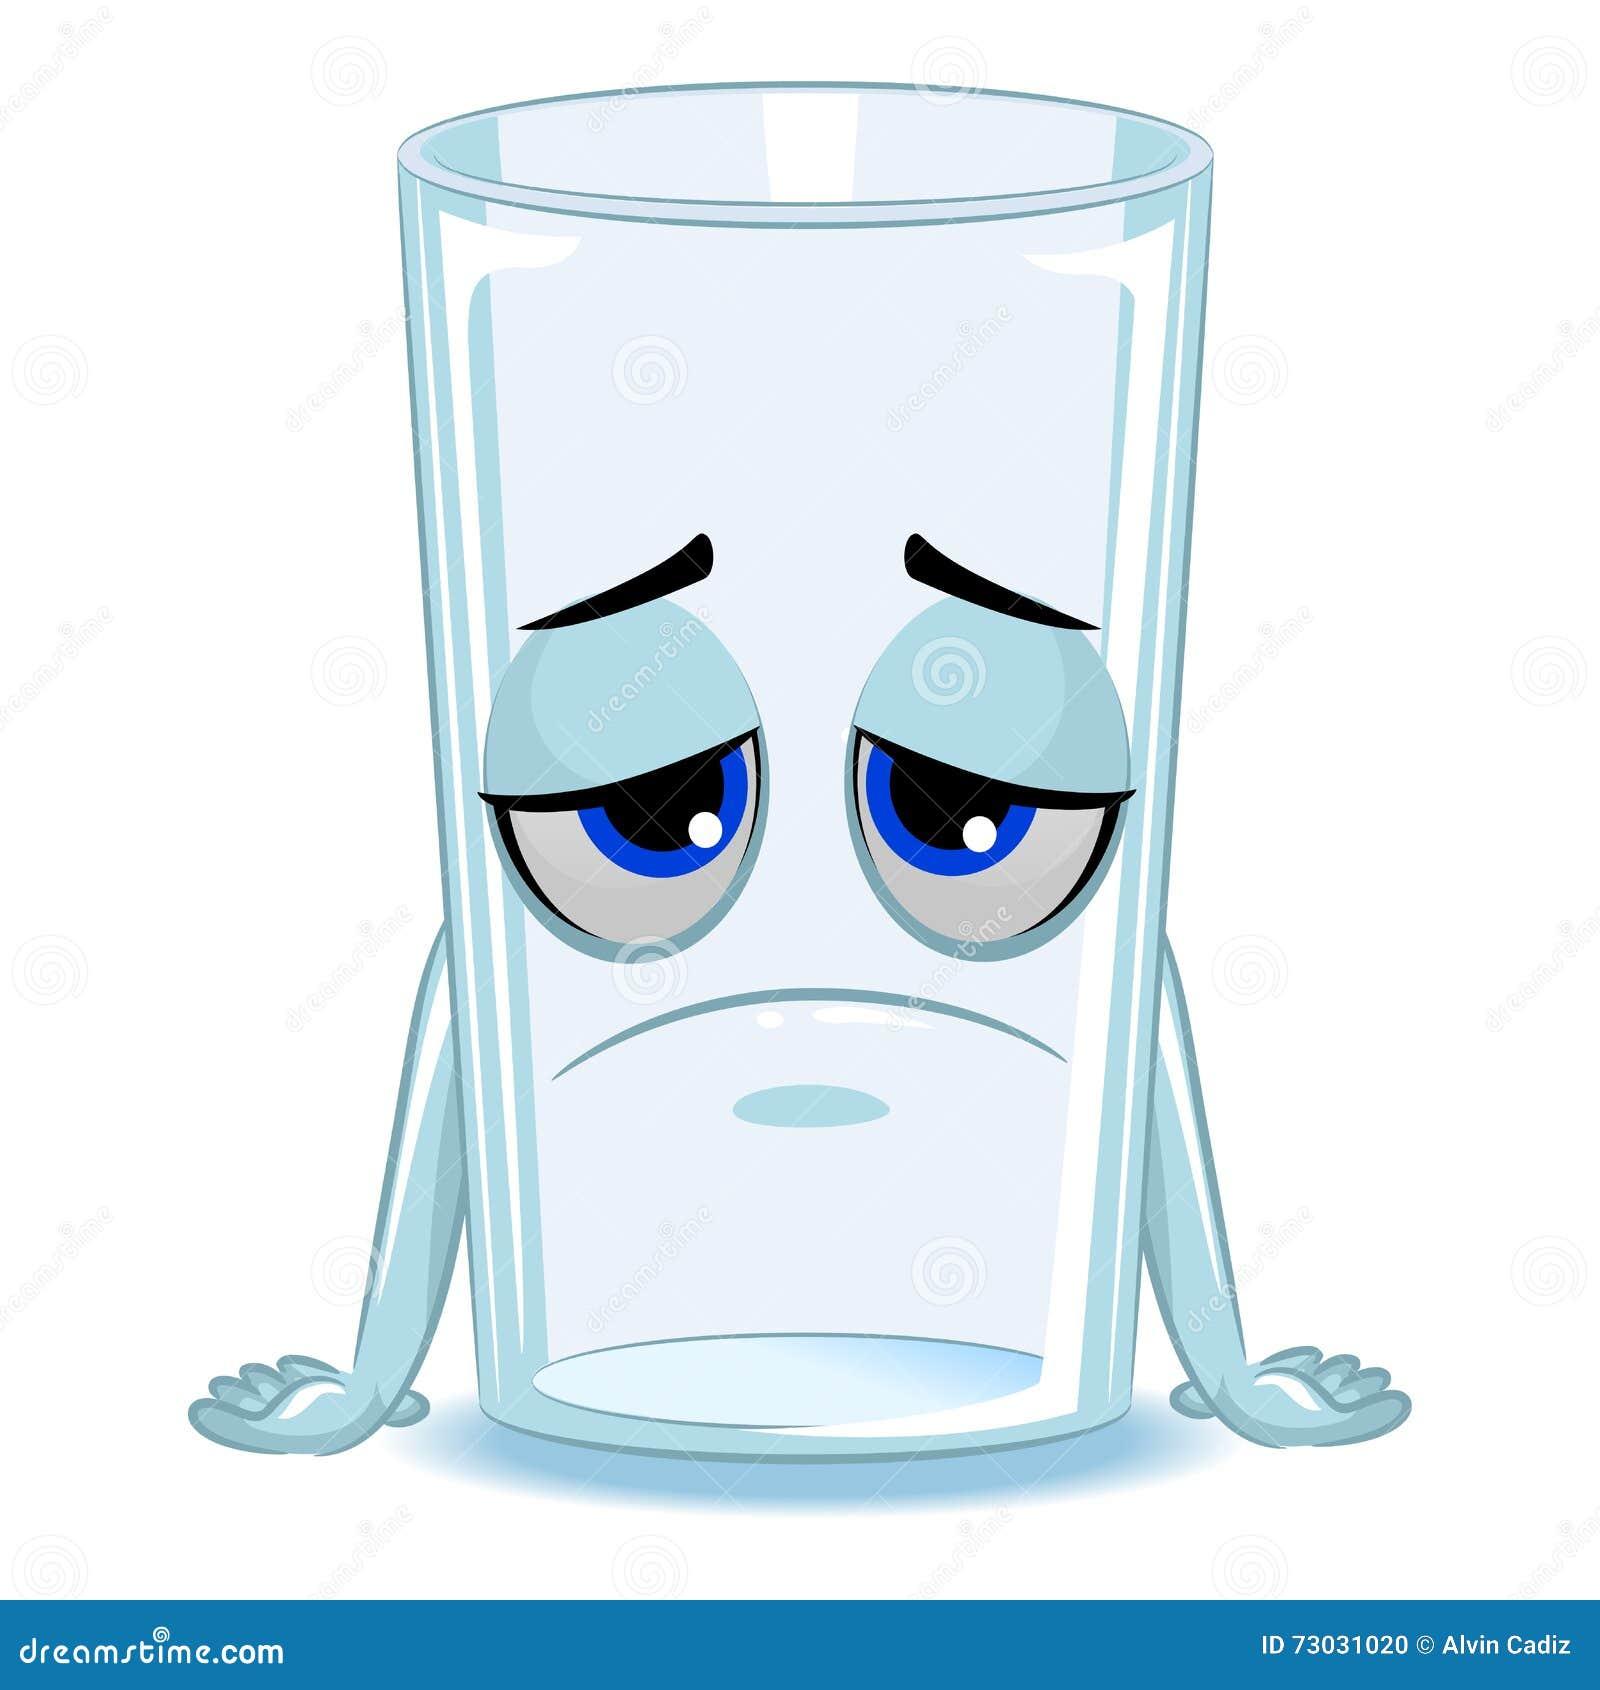 Empty Glass Of Water Mascot Sad Stock Vector - Image: 73031020